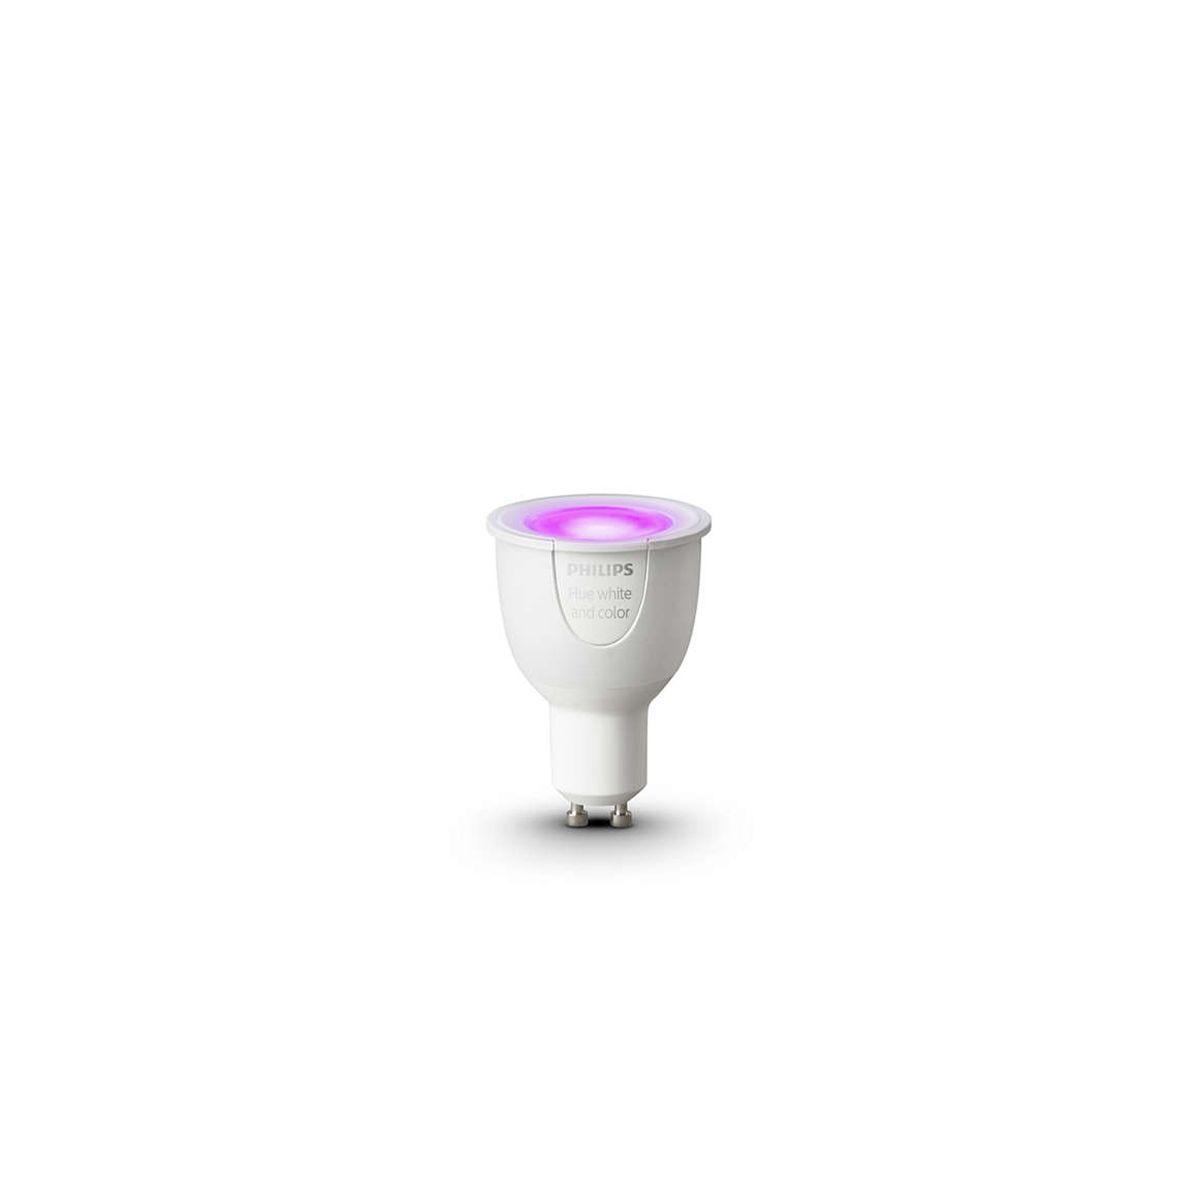 Hue White and Colour Ambience Single GU10 v2